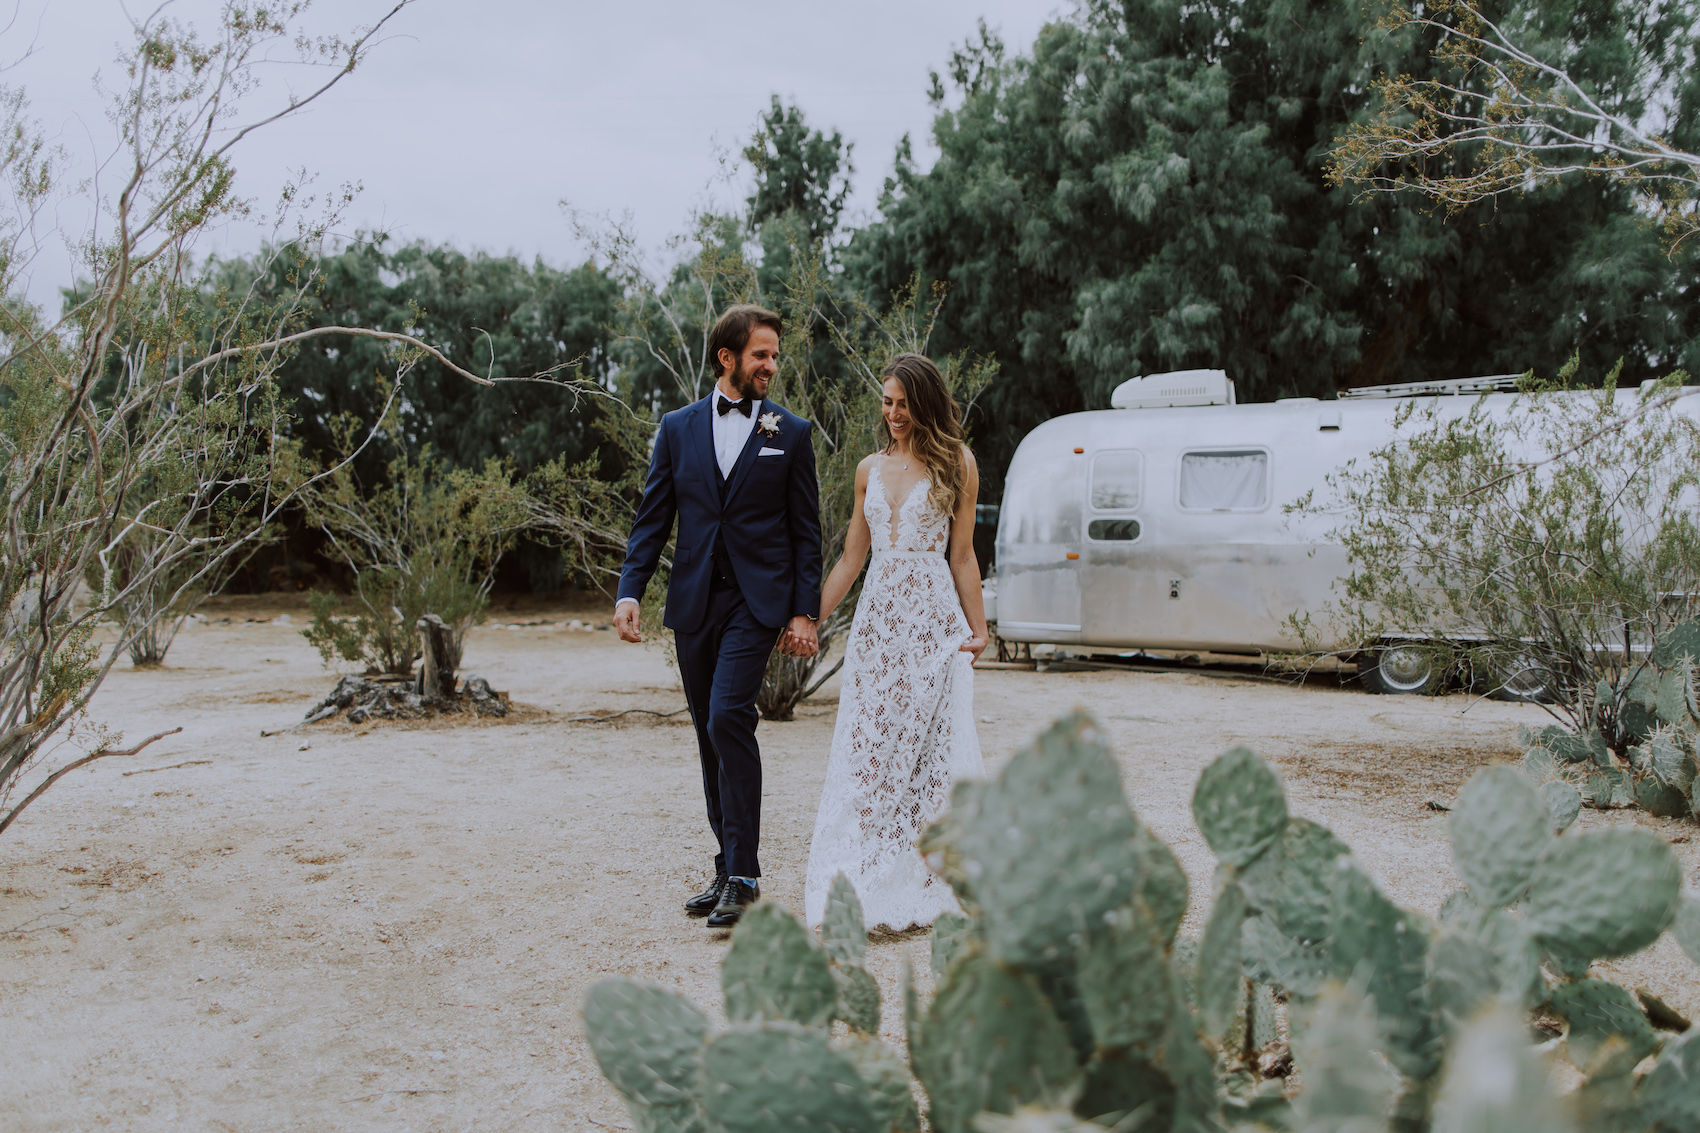 29-Palms-Inn-Joshua-Tree-Jewish-Wedding-H+M-27.jpg